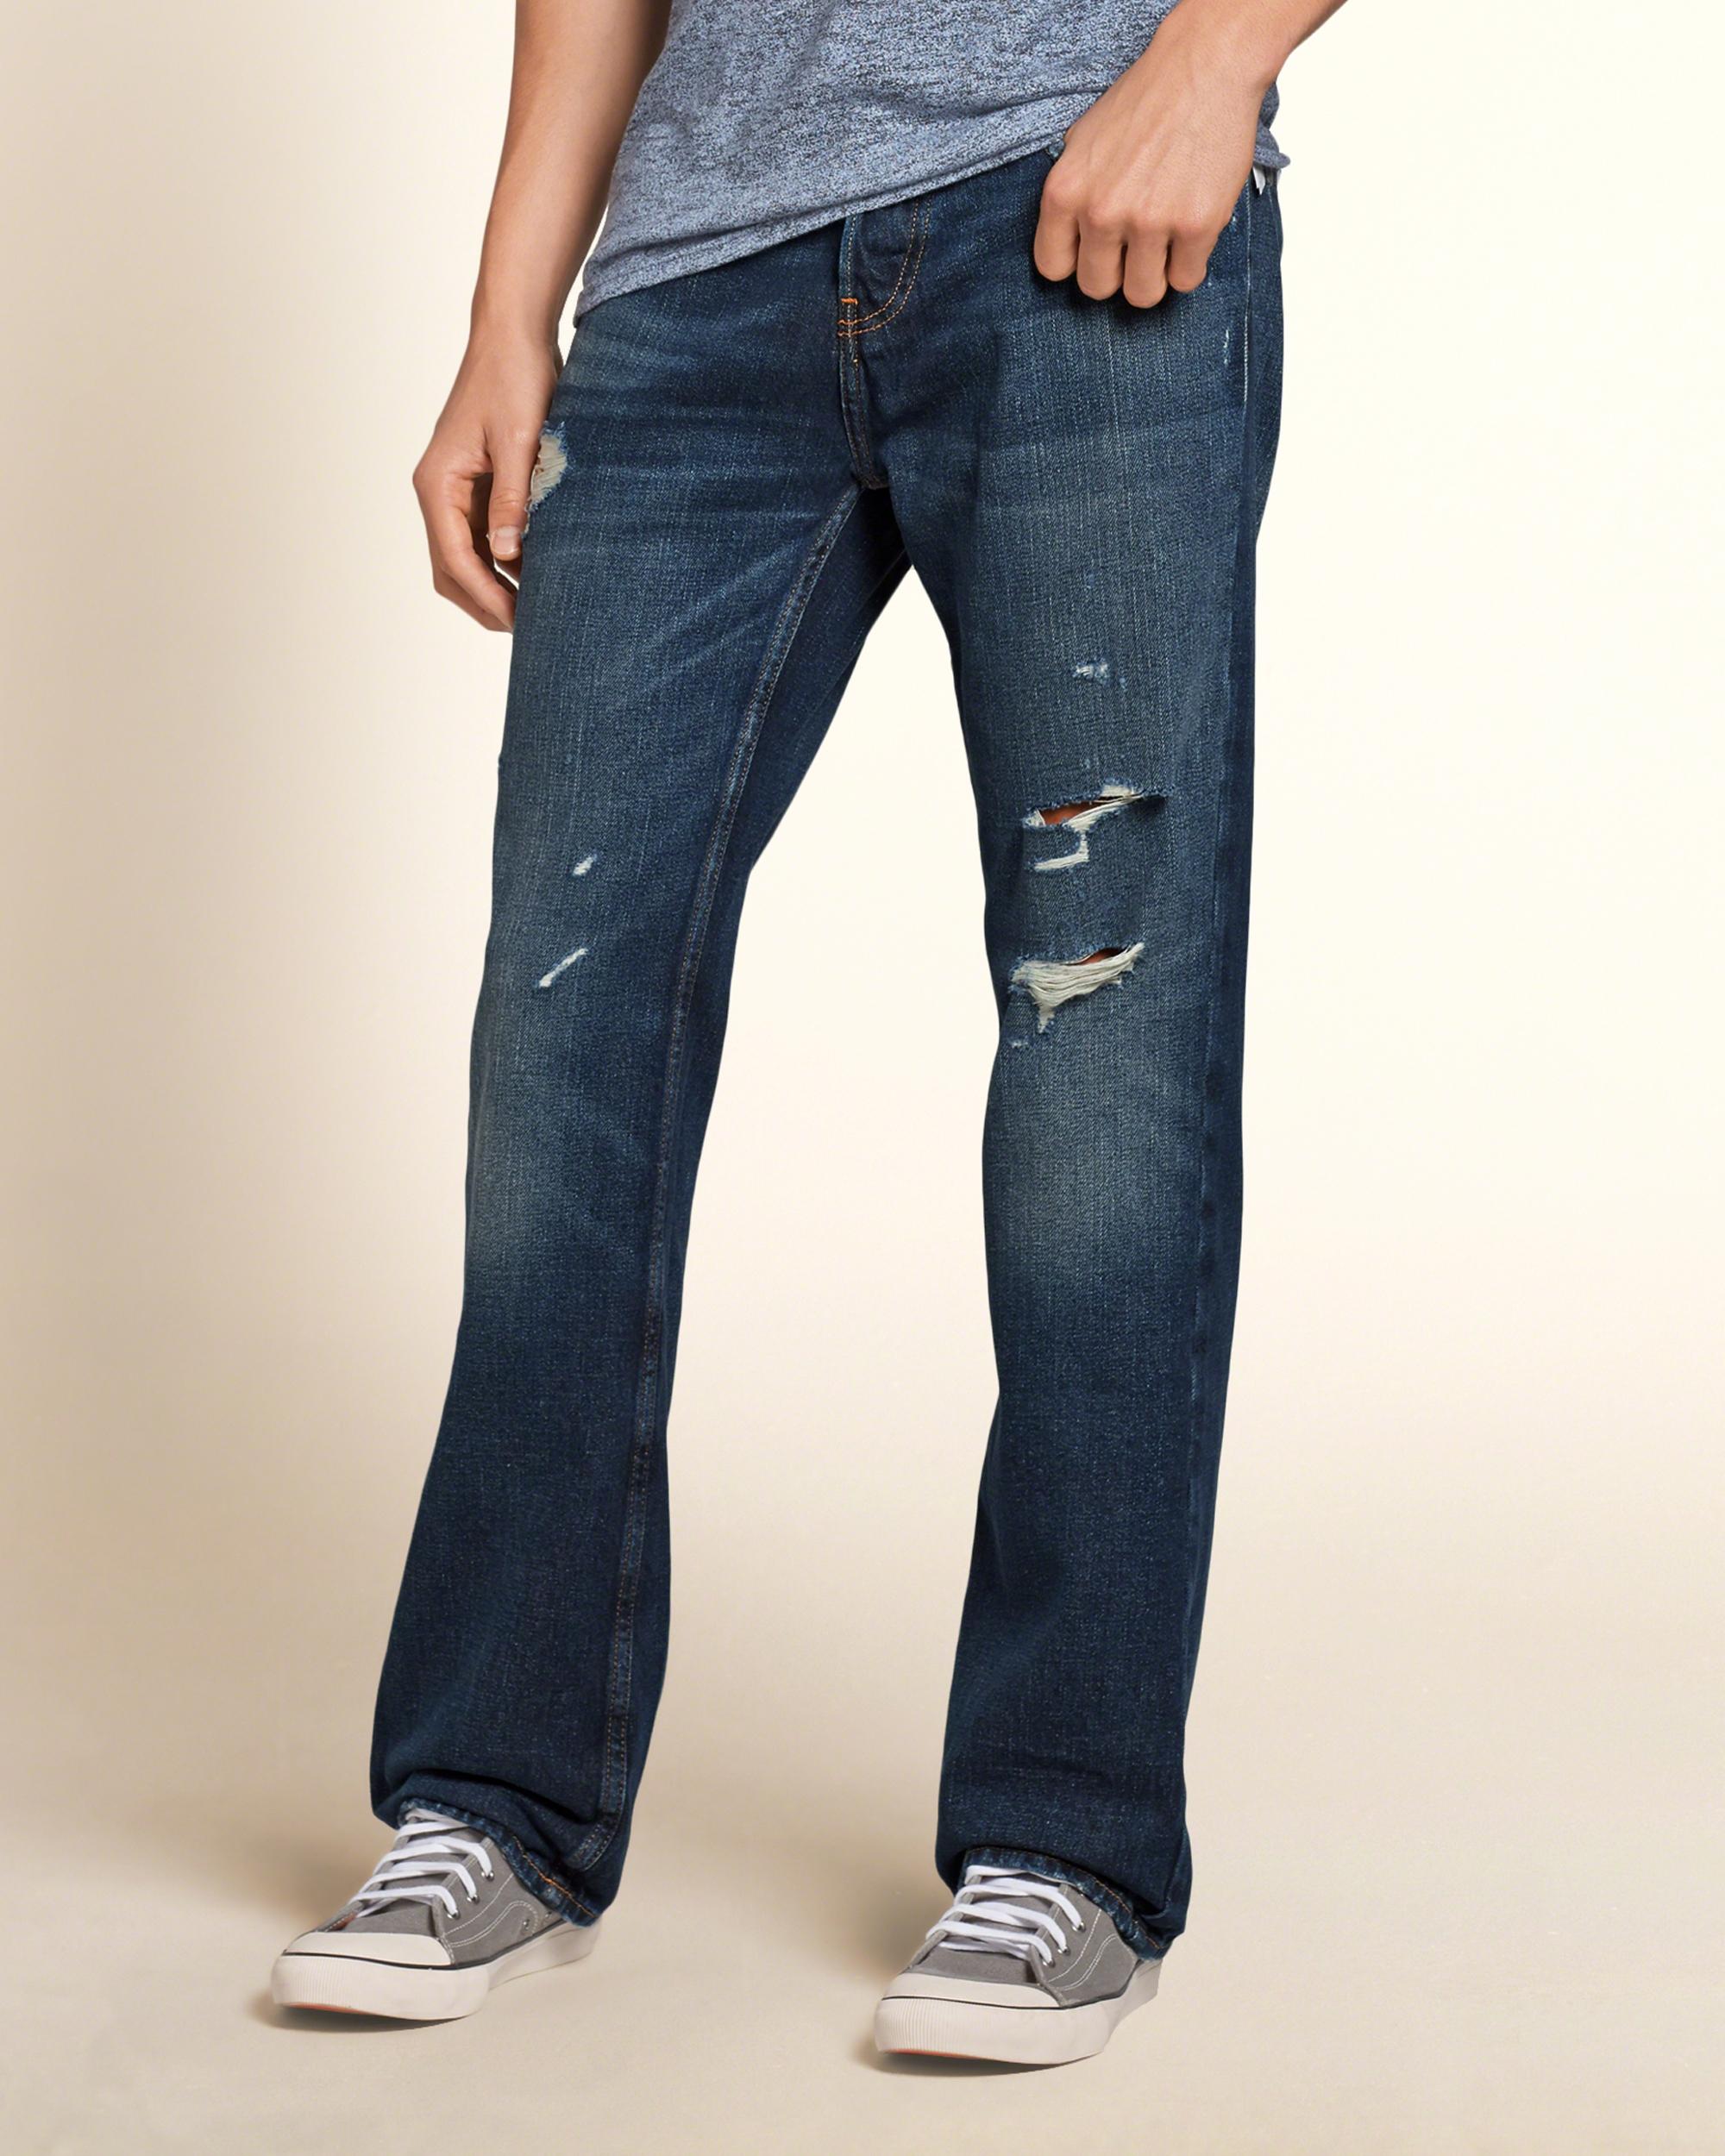 hollister pants for men - photo #38